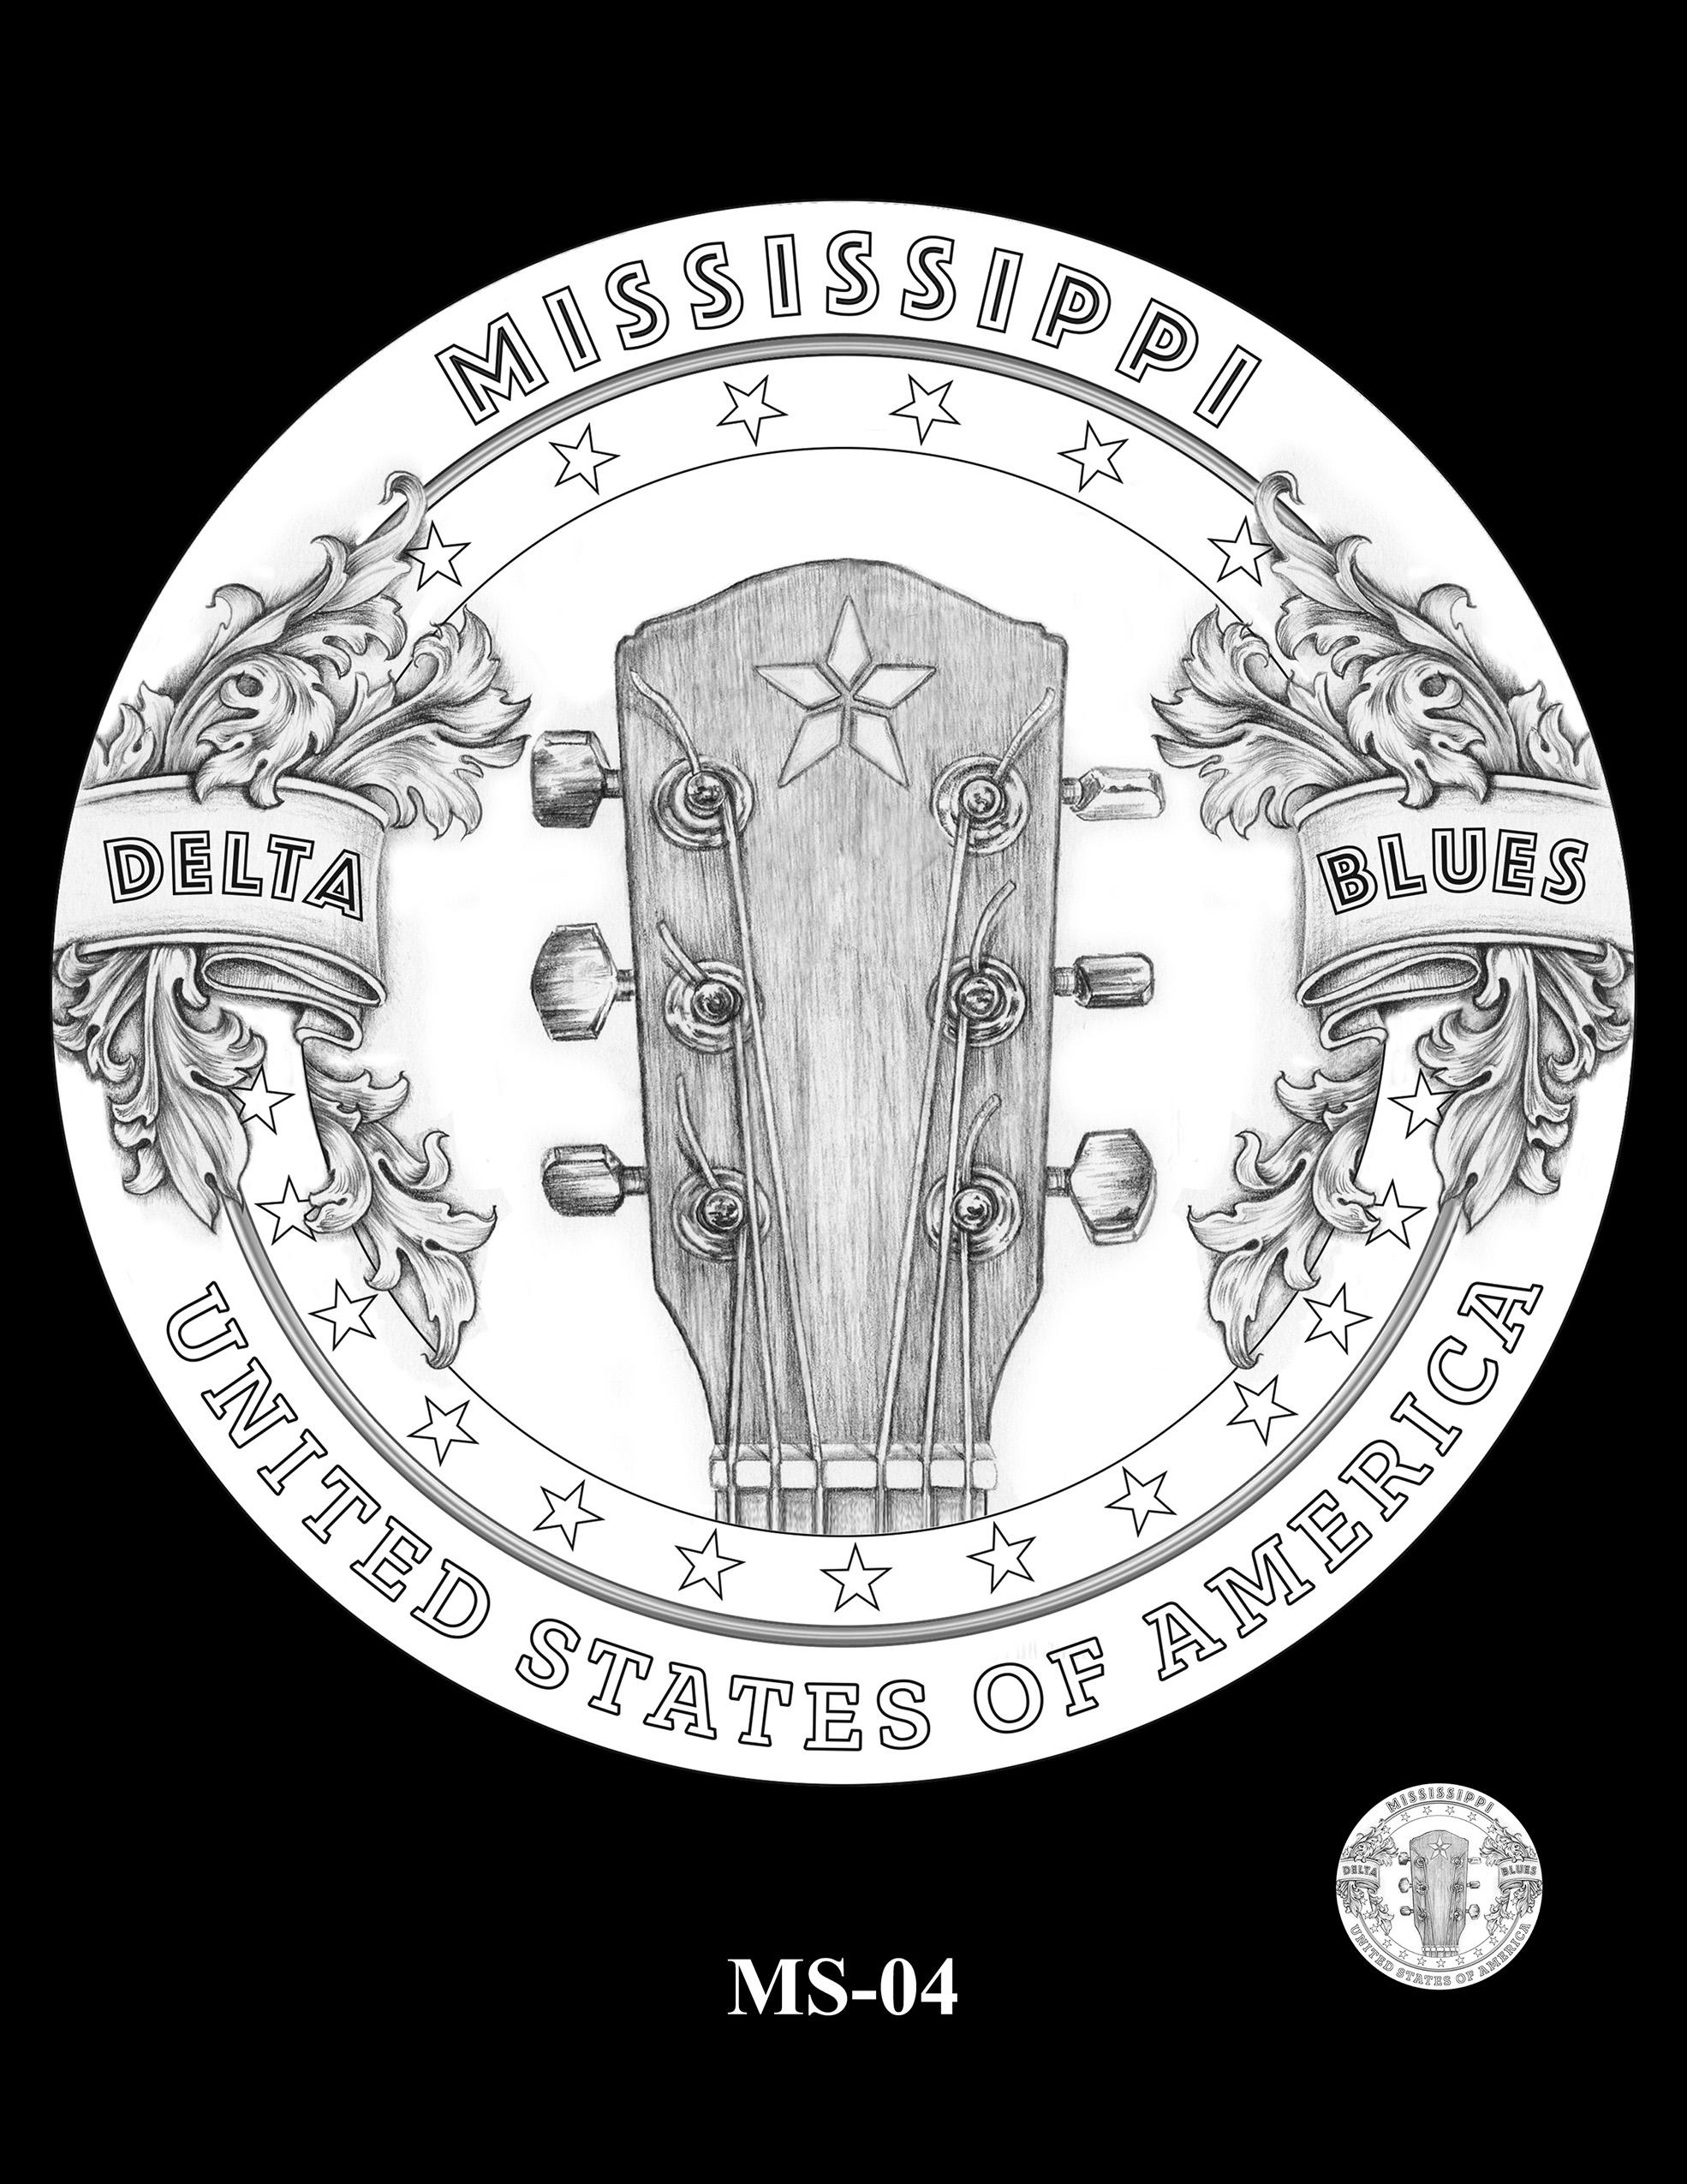 MS-04 -- 2023 American Innovation $1 Coin Program - Mississippi